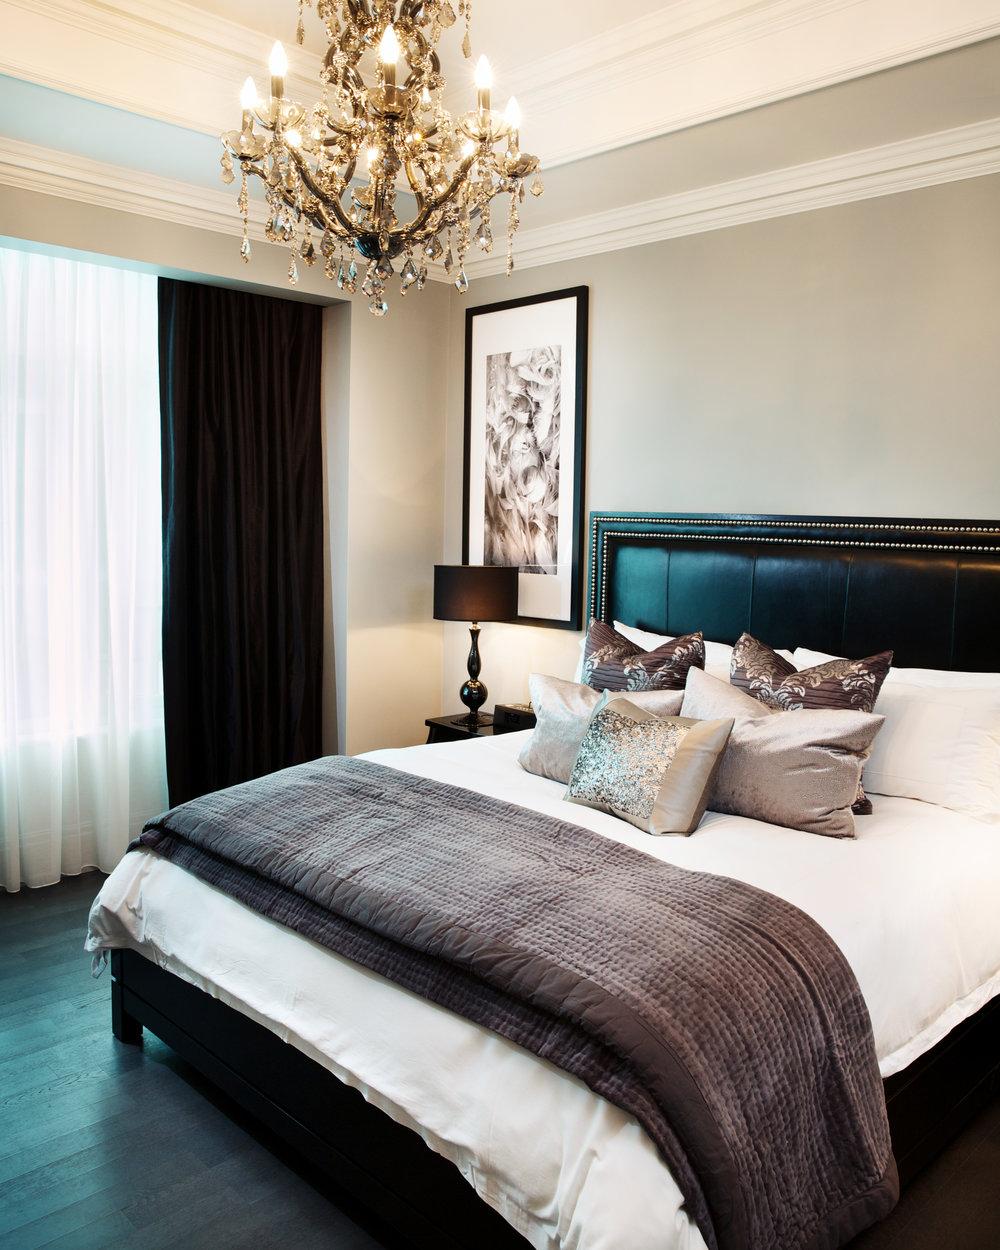 Residence 3501 Master bedroom - Teddy Chau.jpg